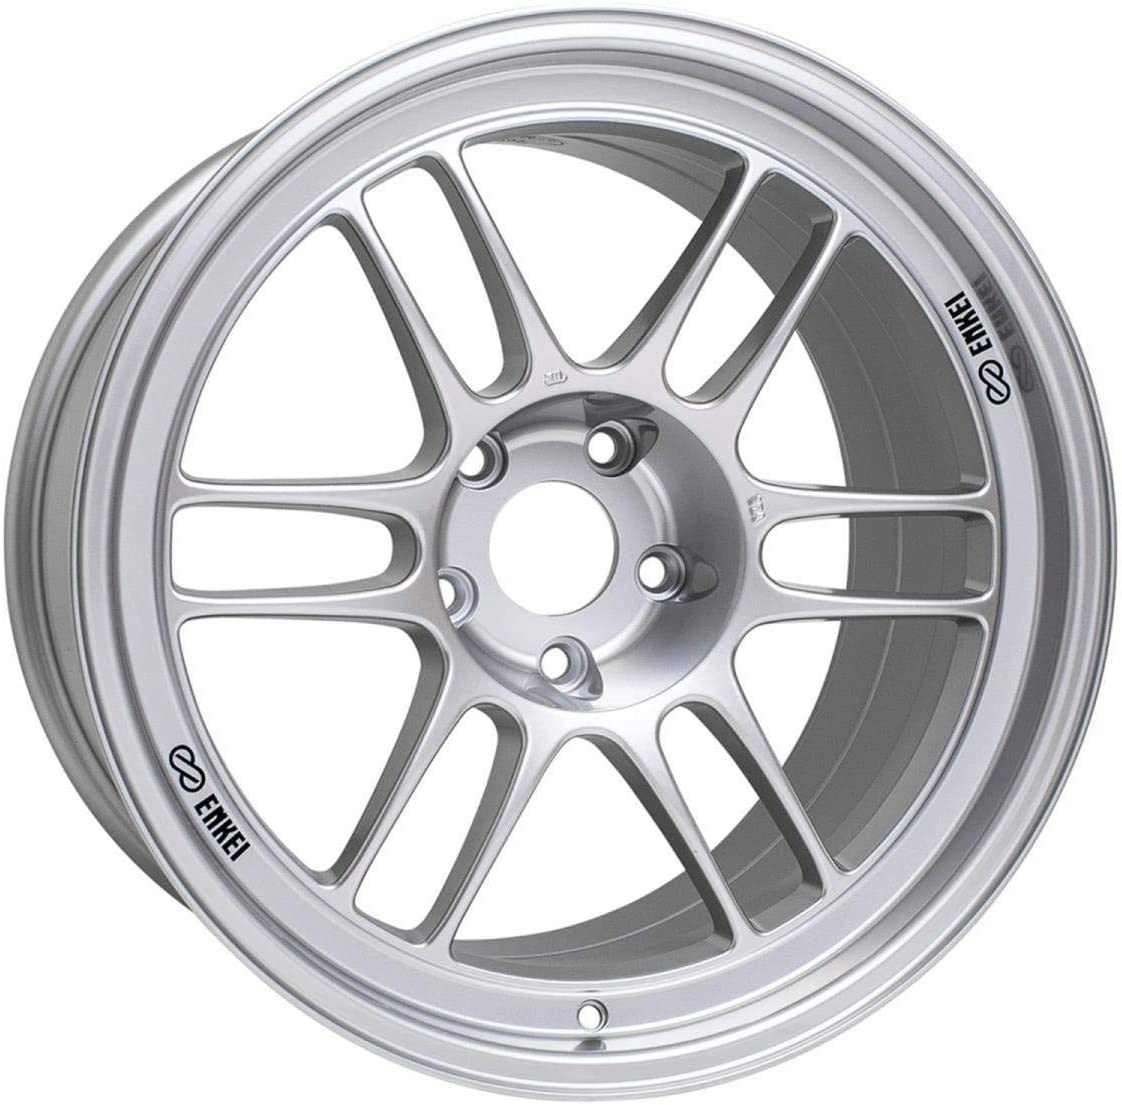 Enkei RPF1 (18 x 8.5, 5 x 114.3) 40mm Offset, Silver, (1) Wheel/Rim